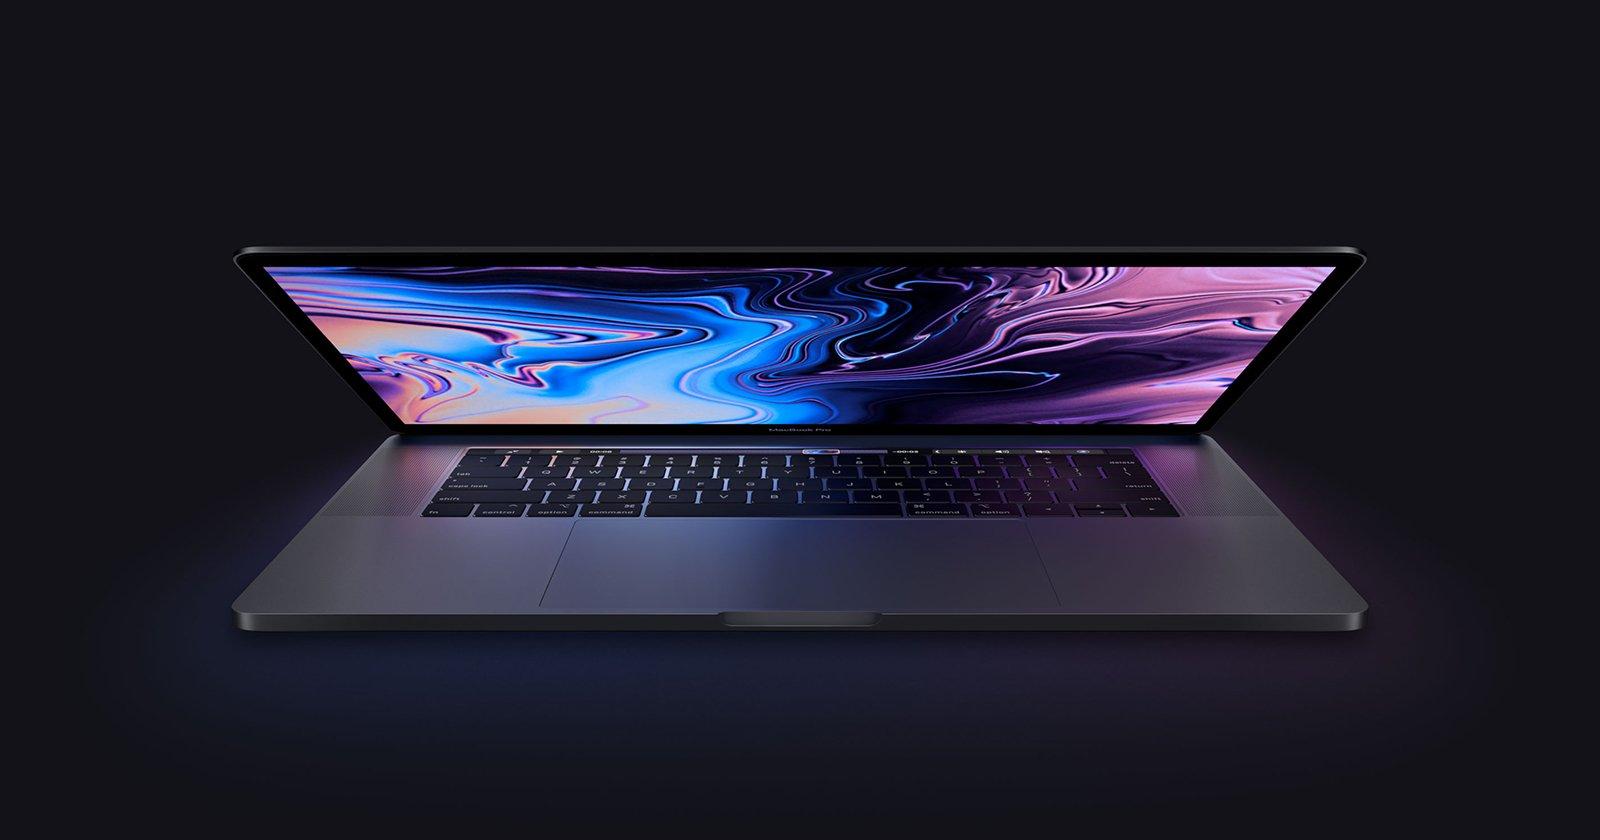 Apple Kills Off the Last Non-Touchbar MacBook Pros, Discounts MacBook Air